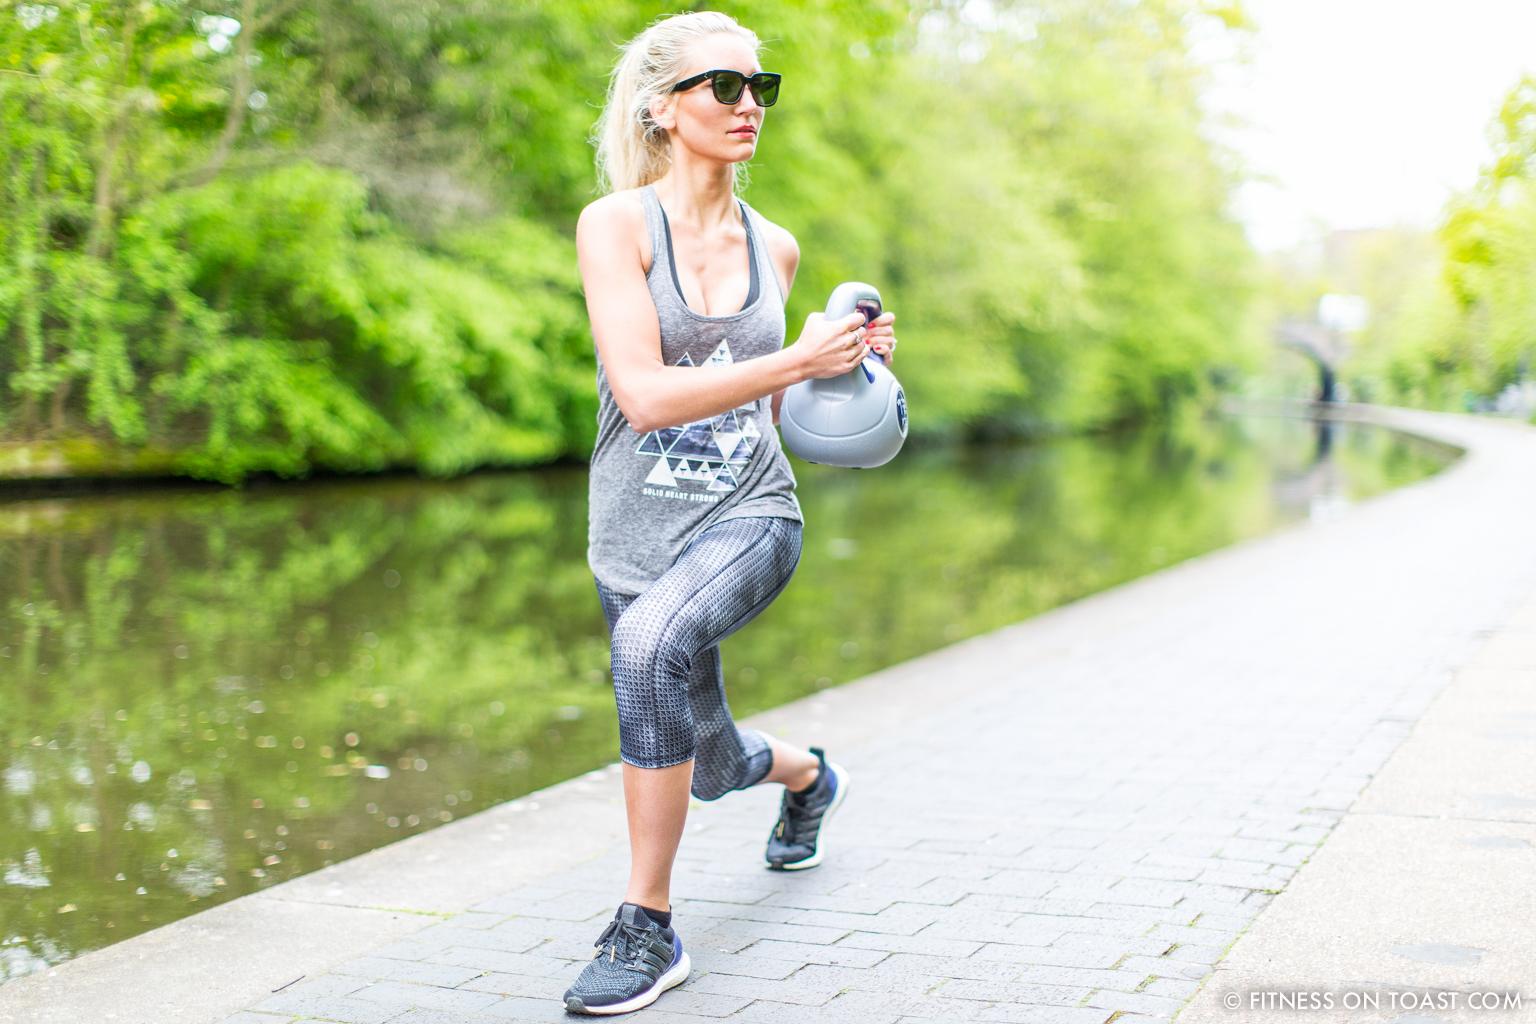 Fitness On Toast Faya Blog Girl Healthy Workout Regents Canal London Kettle Bell Squat Swing Lunge Twist Burpees Old Navy Fashion OOTD Gap Chanel Celine-6